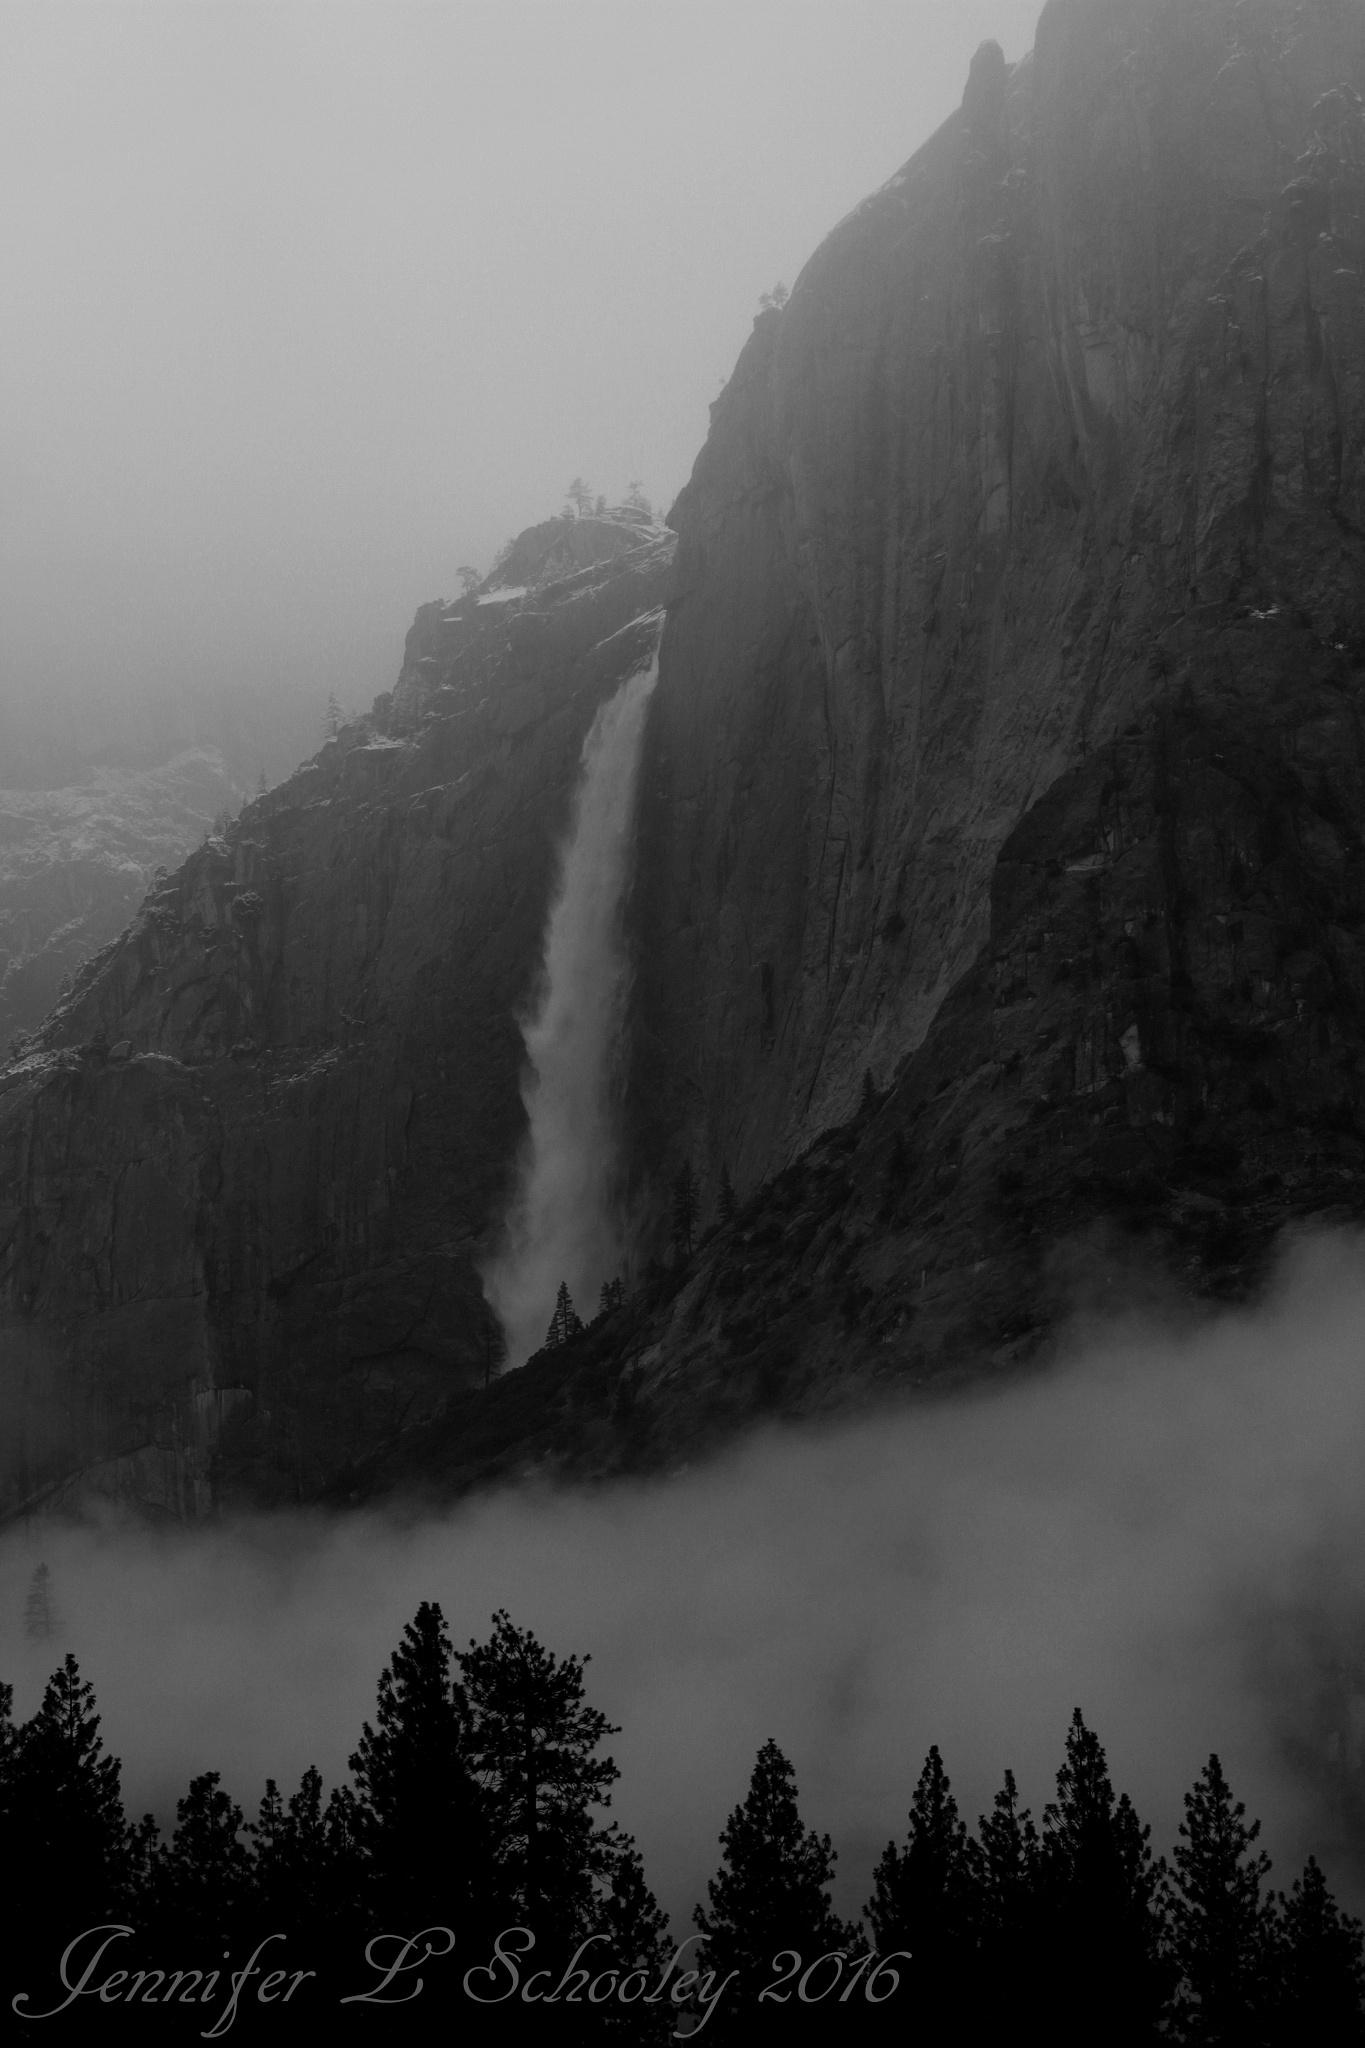 Yosemite Falls - Winter Storm - March 2016 by Jennifer Schooley